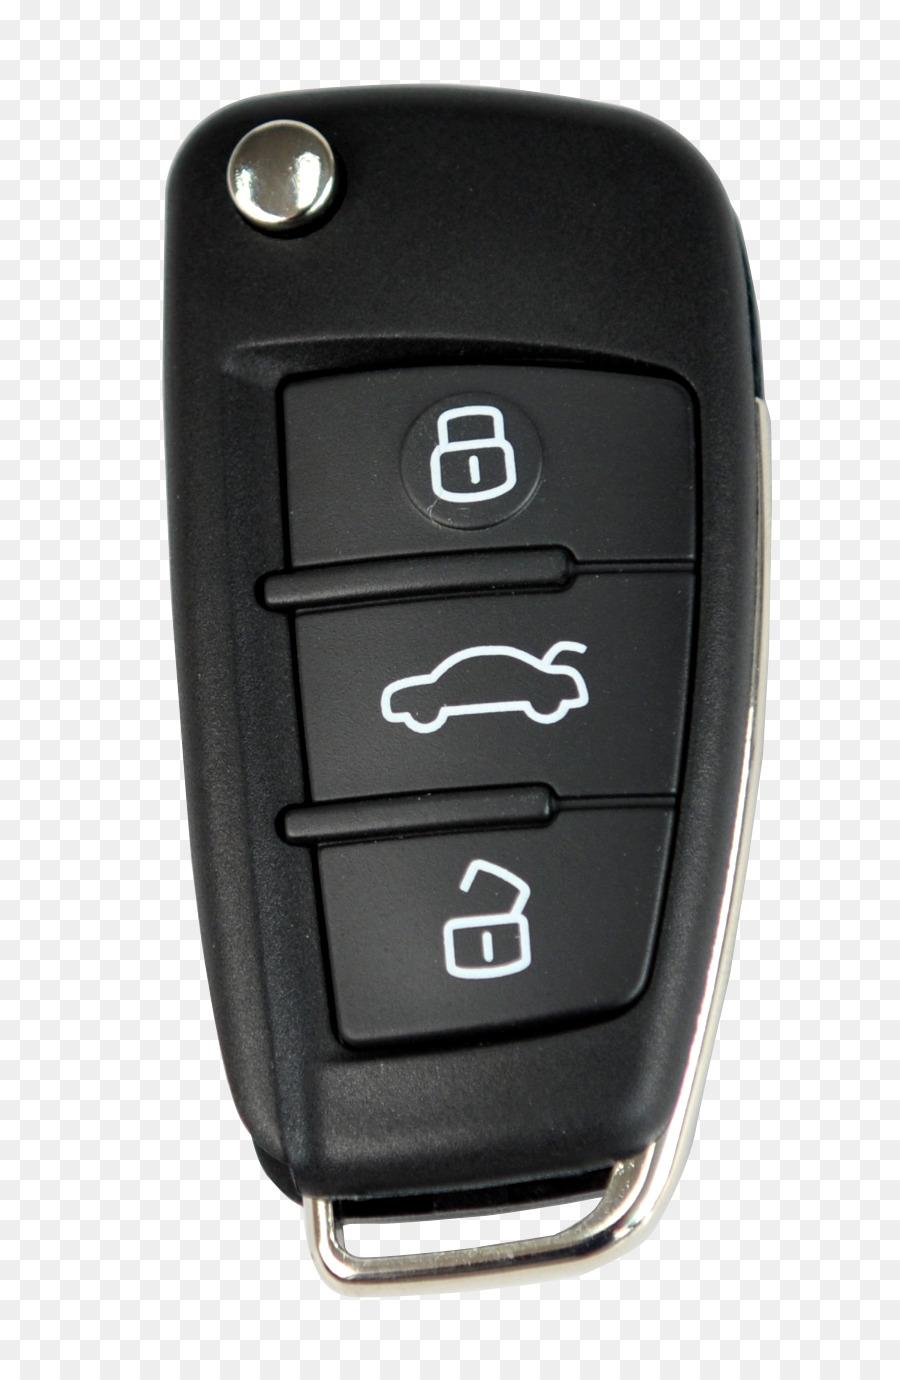 Remote Controls Car Alarm Universal Push Button Control Circuit